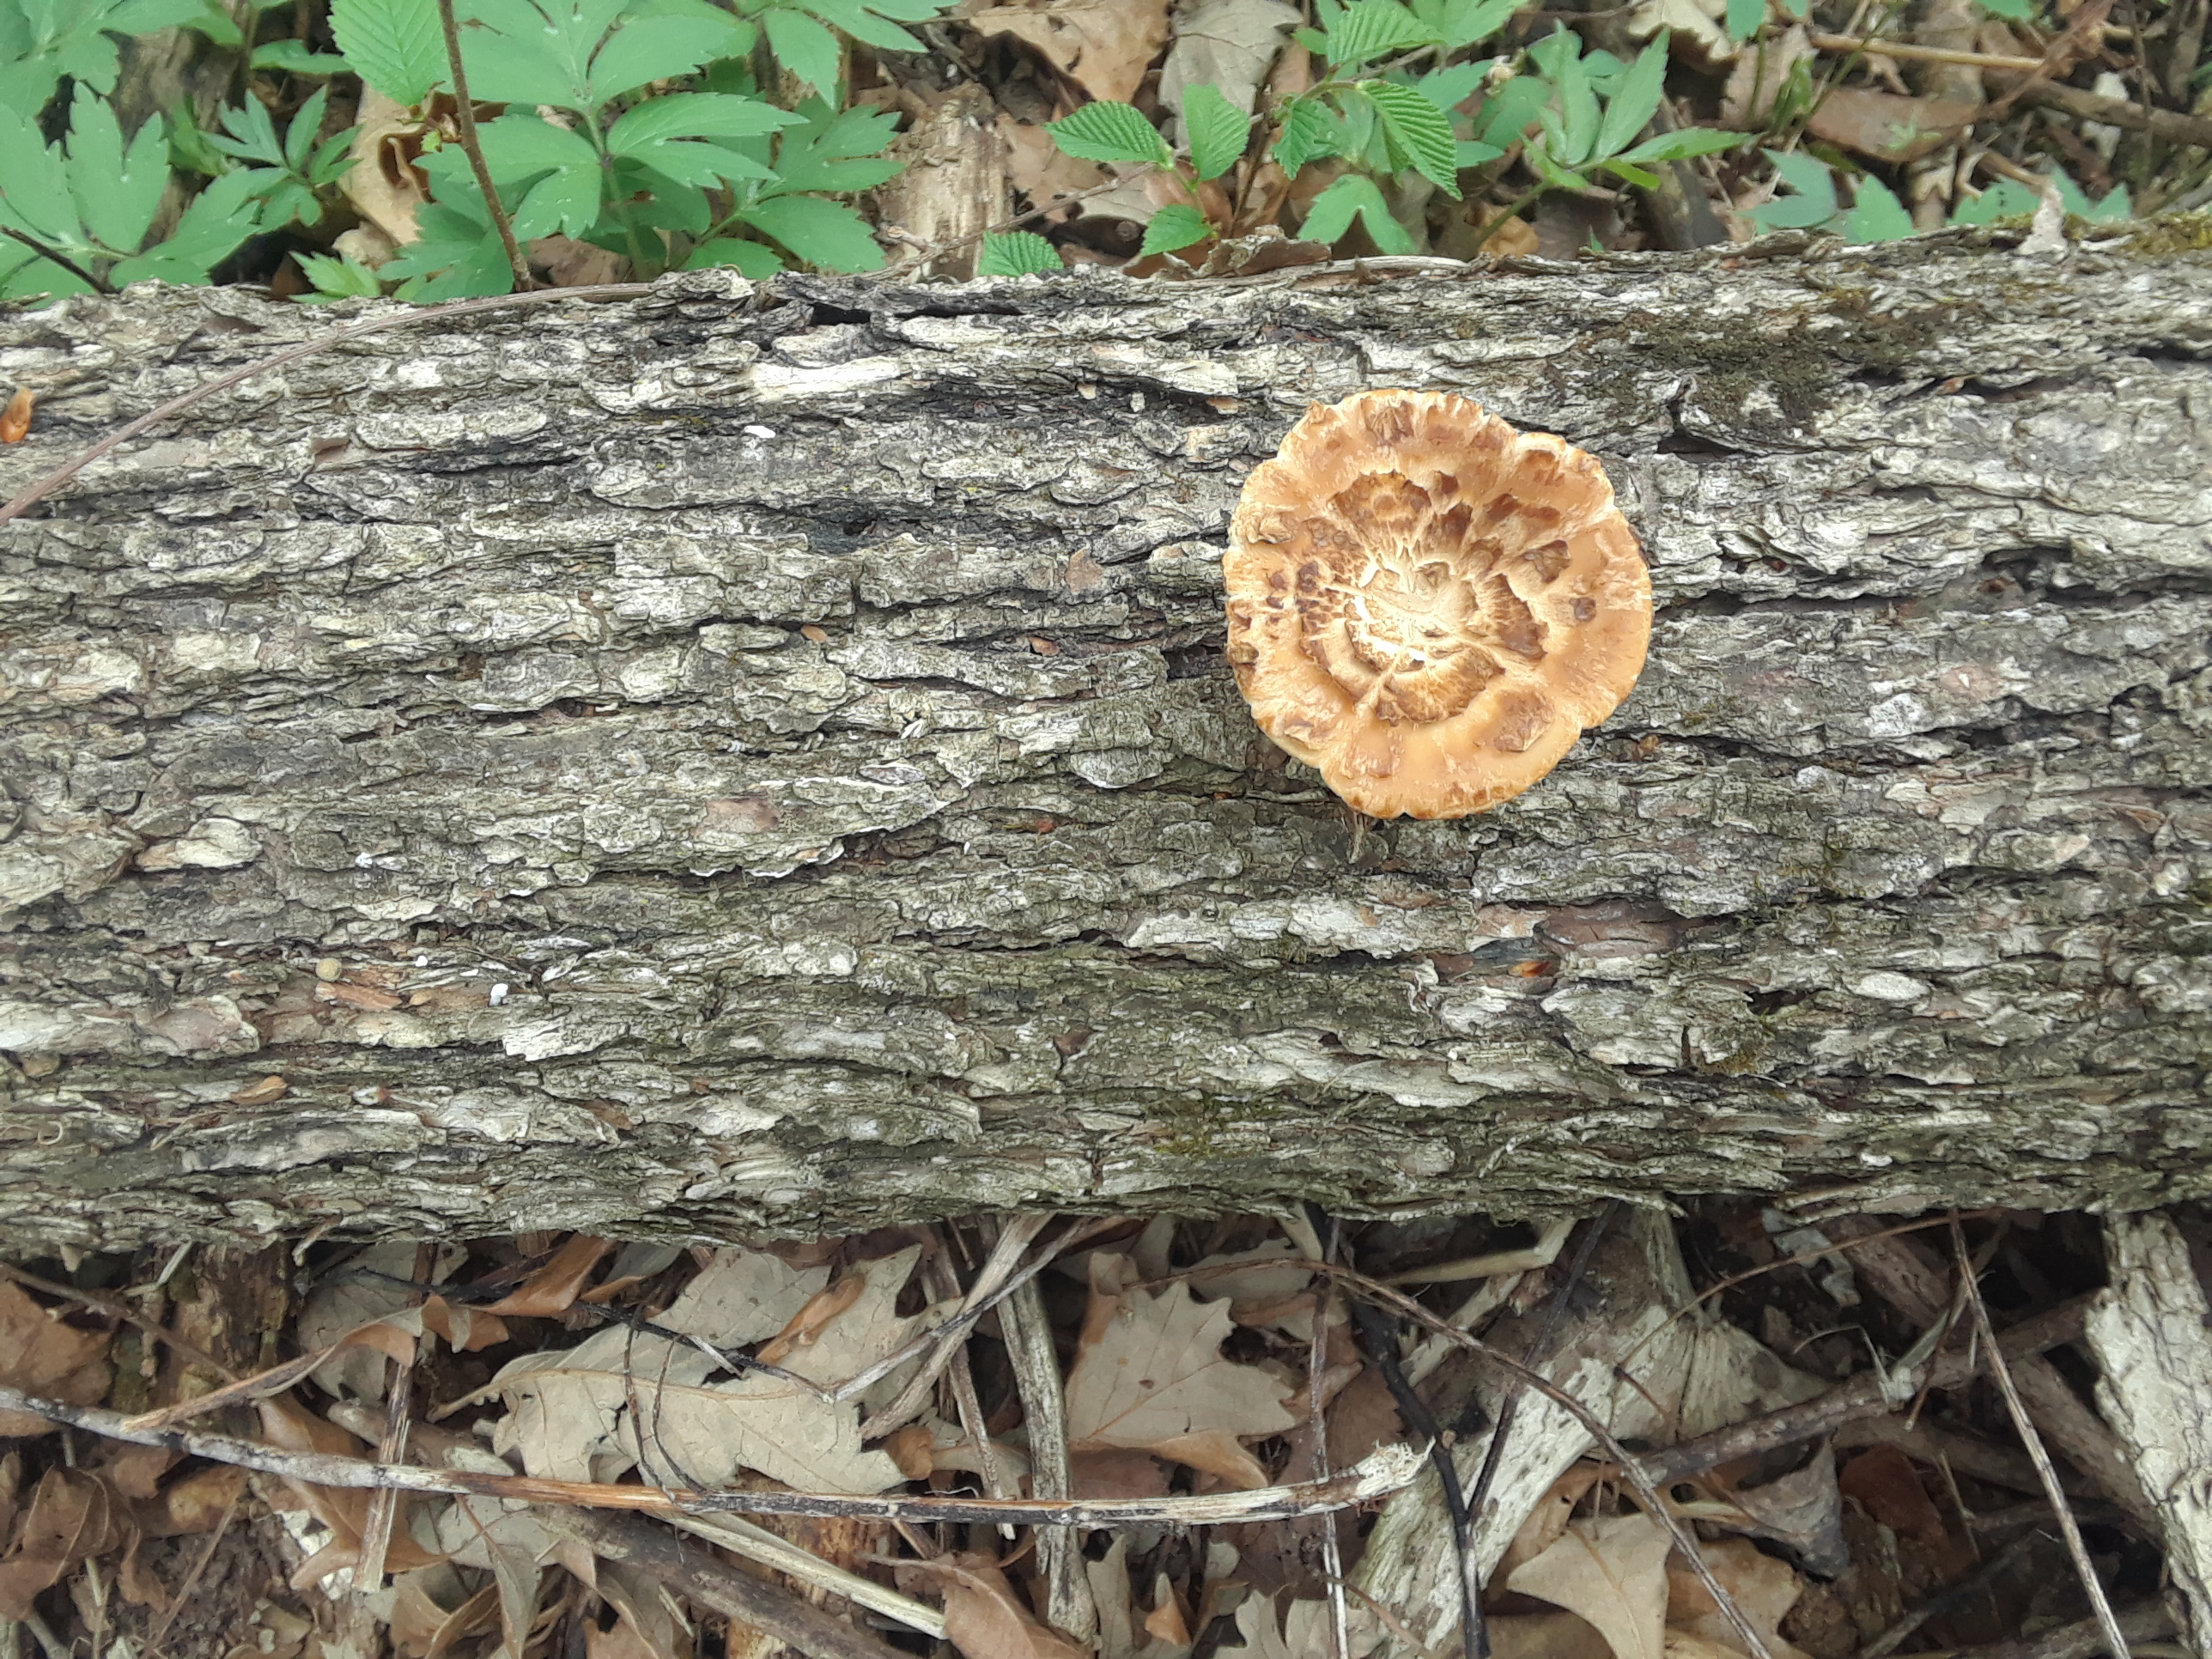 20180514_094314-jpg.43116_Dryad's Saddle mushrooms_Wilderness Survival_Squat the Planet_7:04 PM